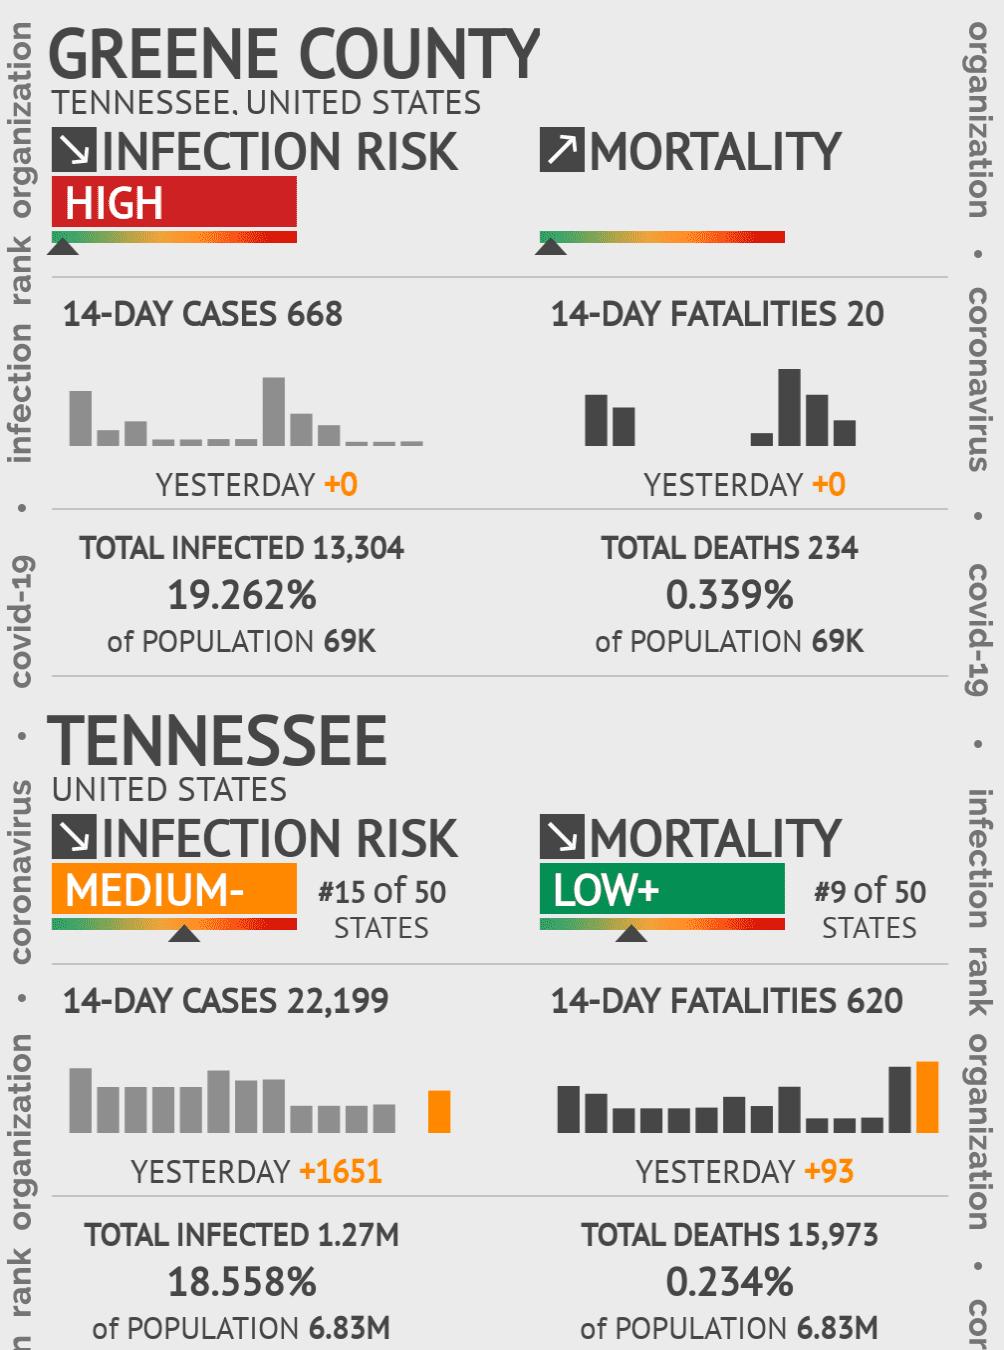 Greene County Coronavirus Covid-19 Risk of Infection on February 28, 2021